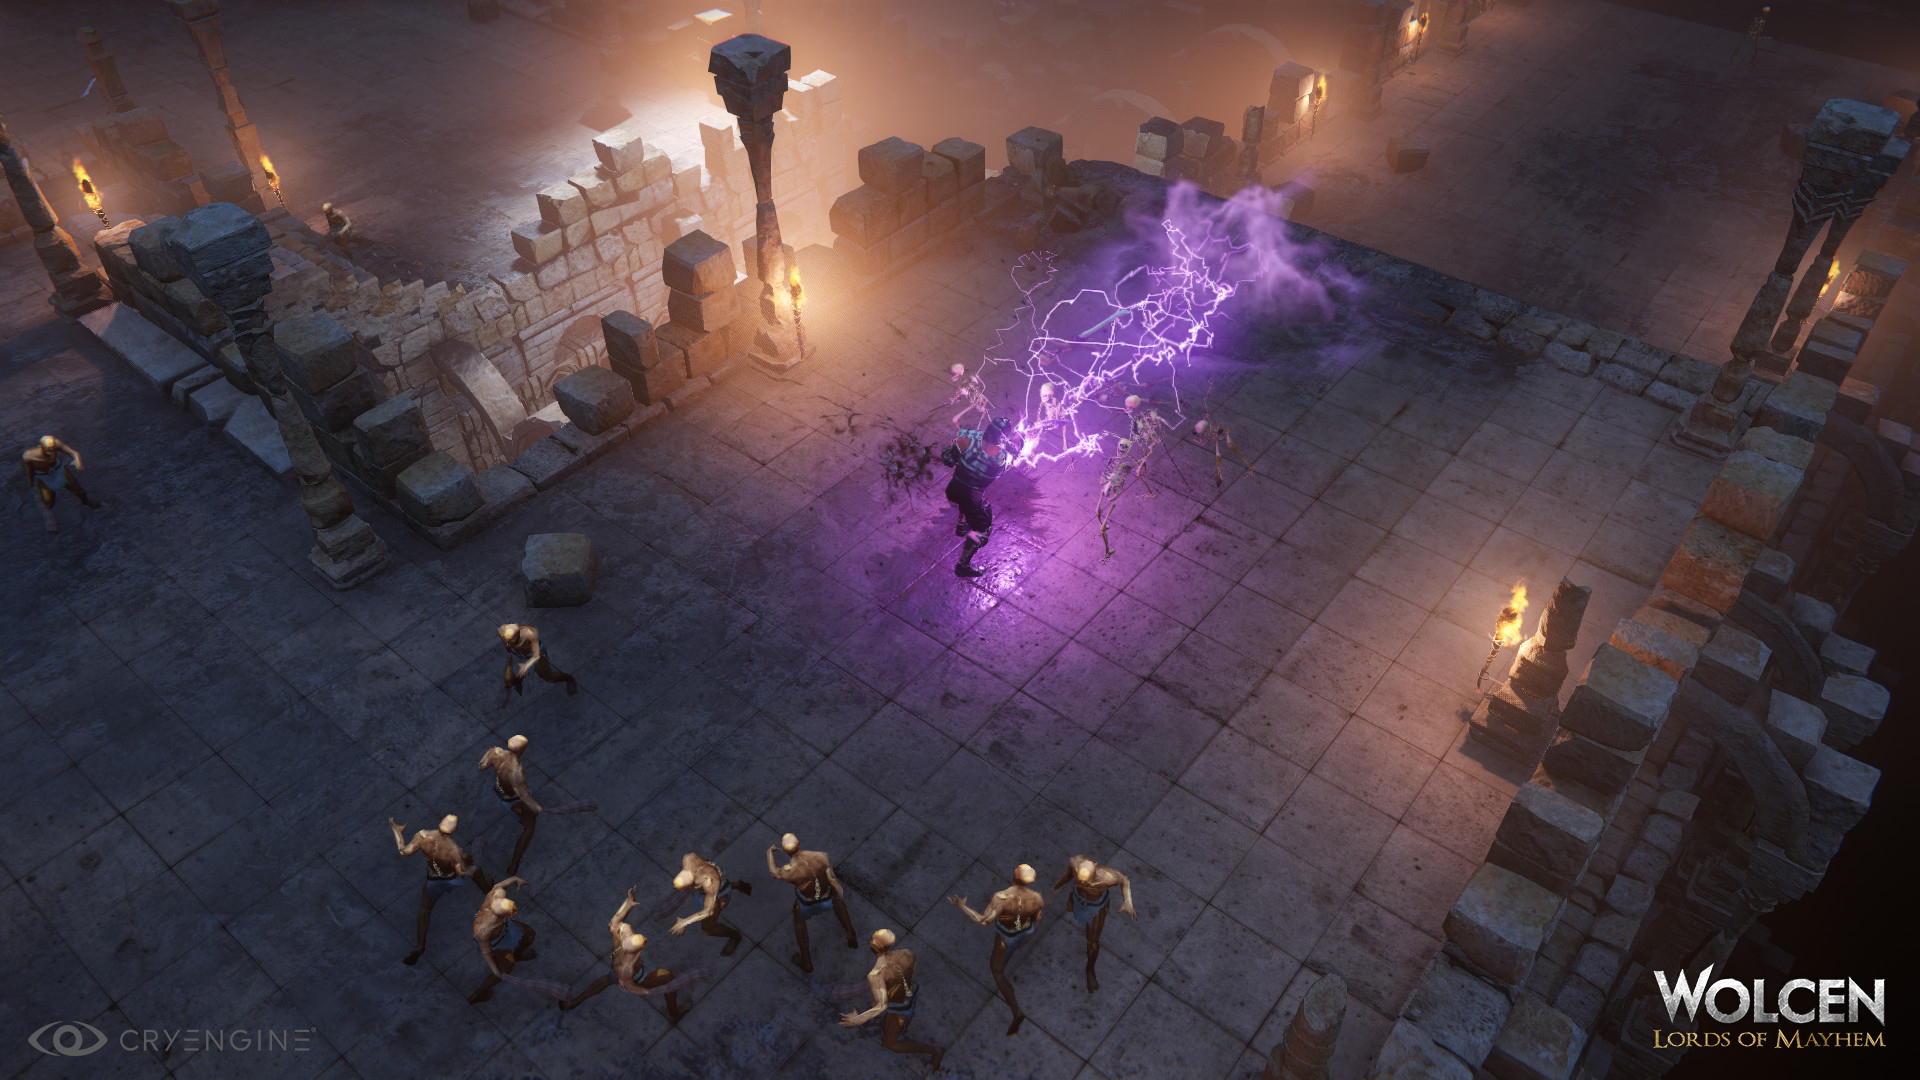 Wolcen: Lords of Mayhem (ENG) [L]